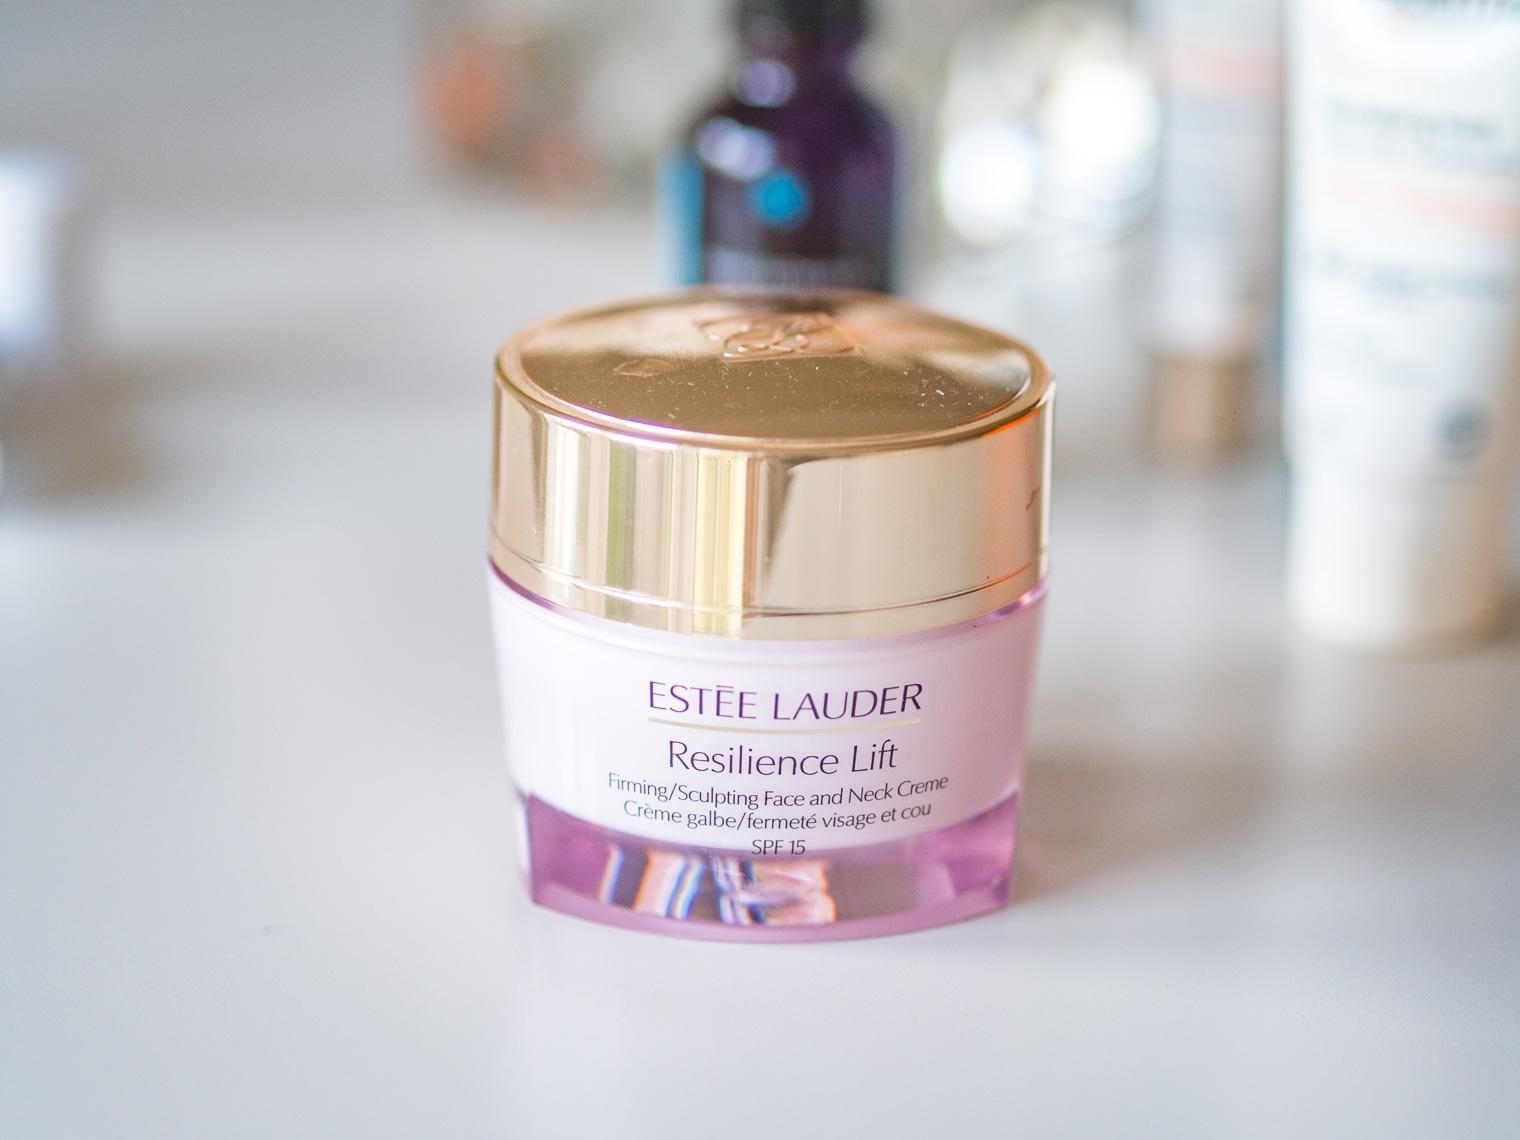 Estee Lauder resilience lift cream